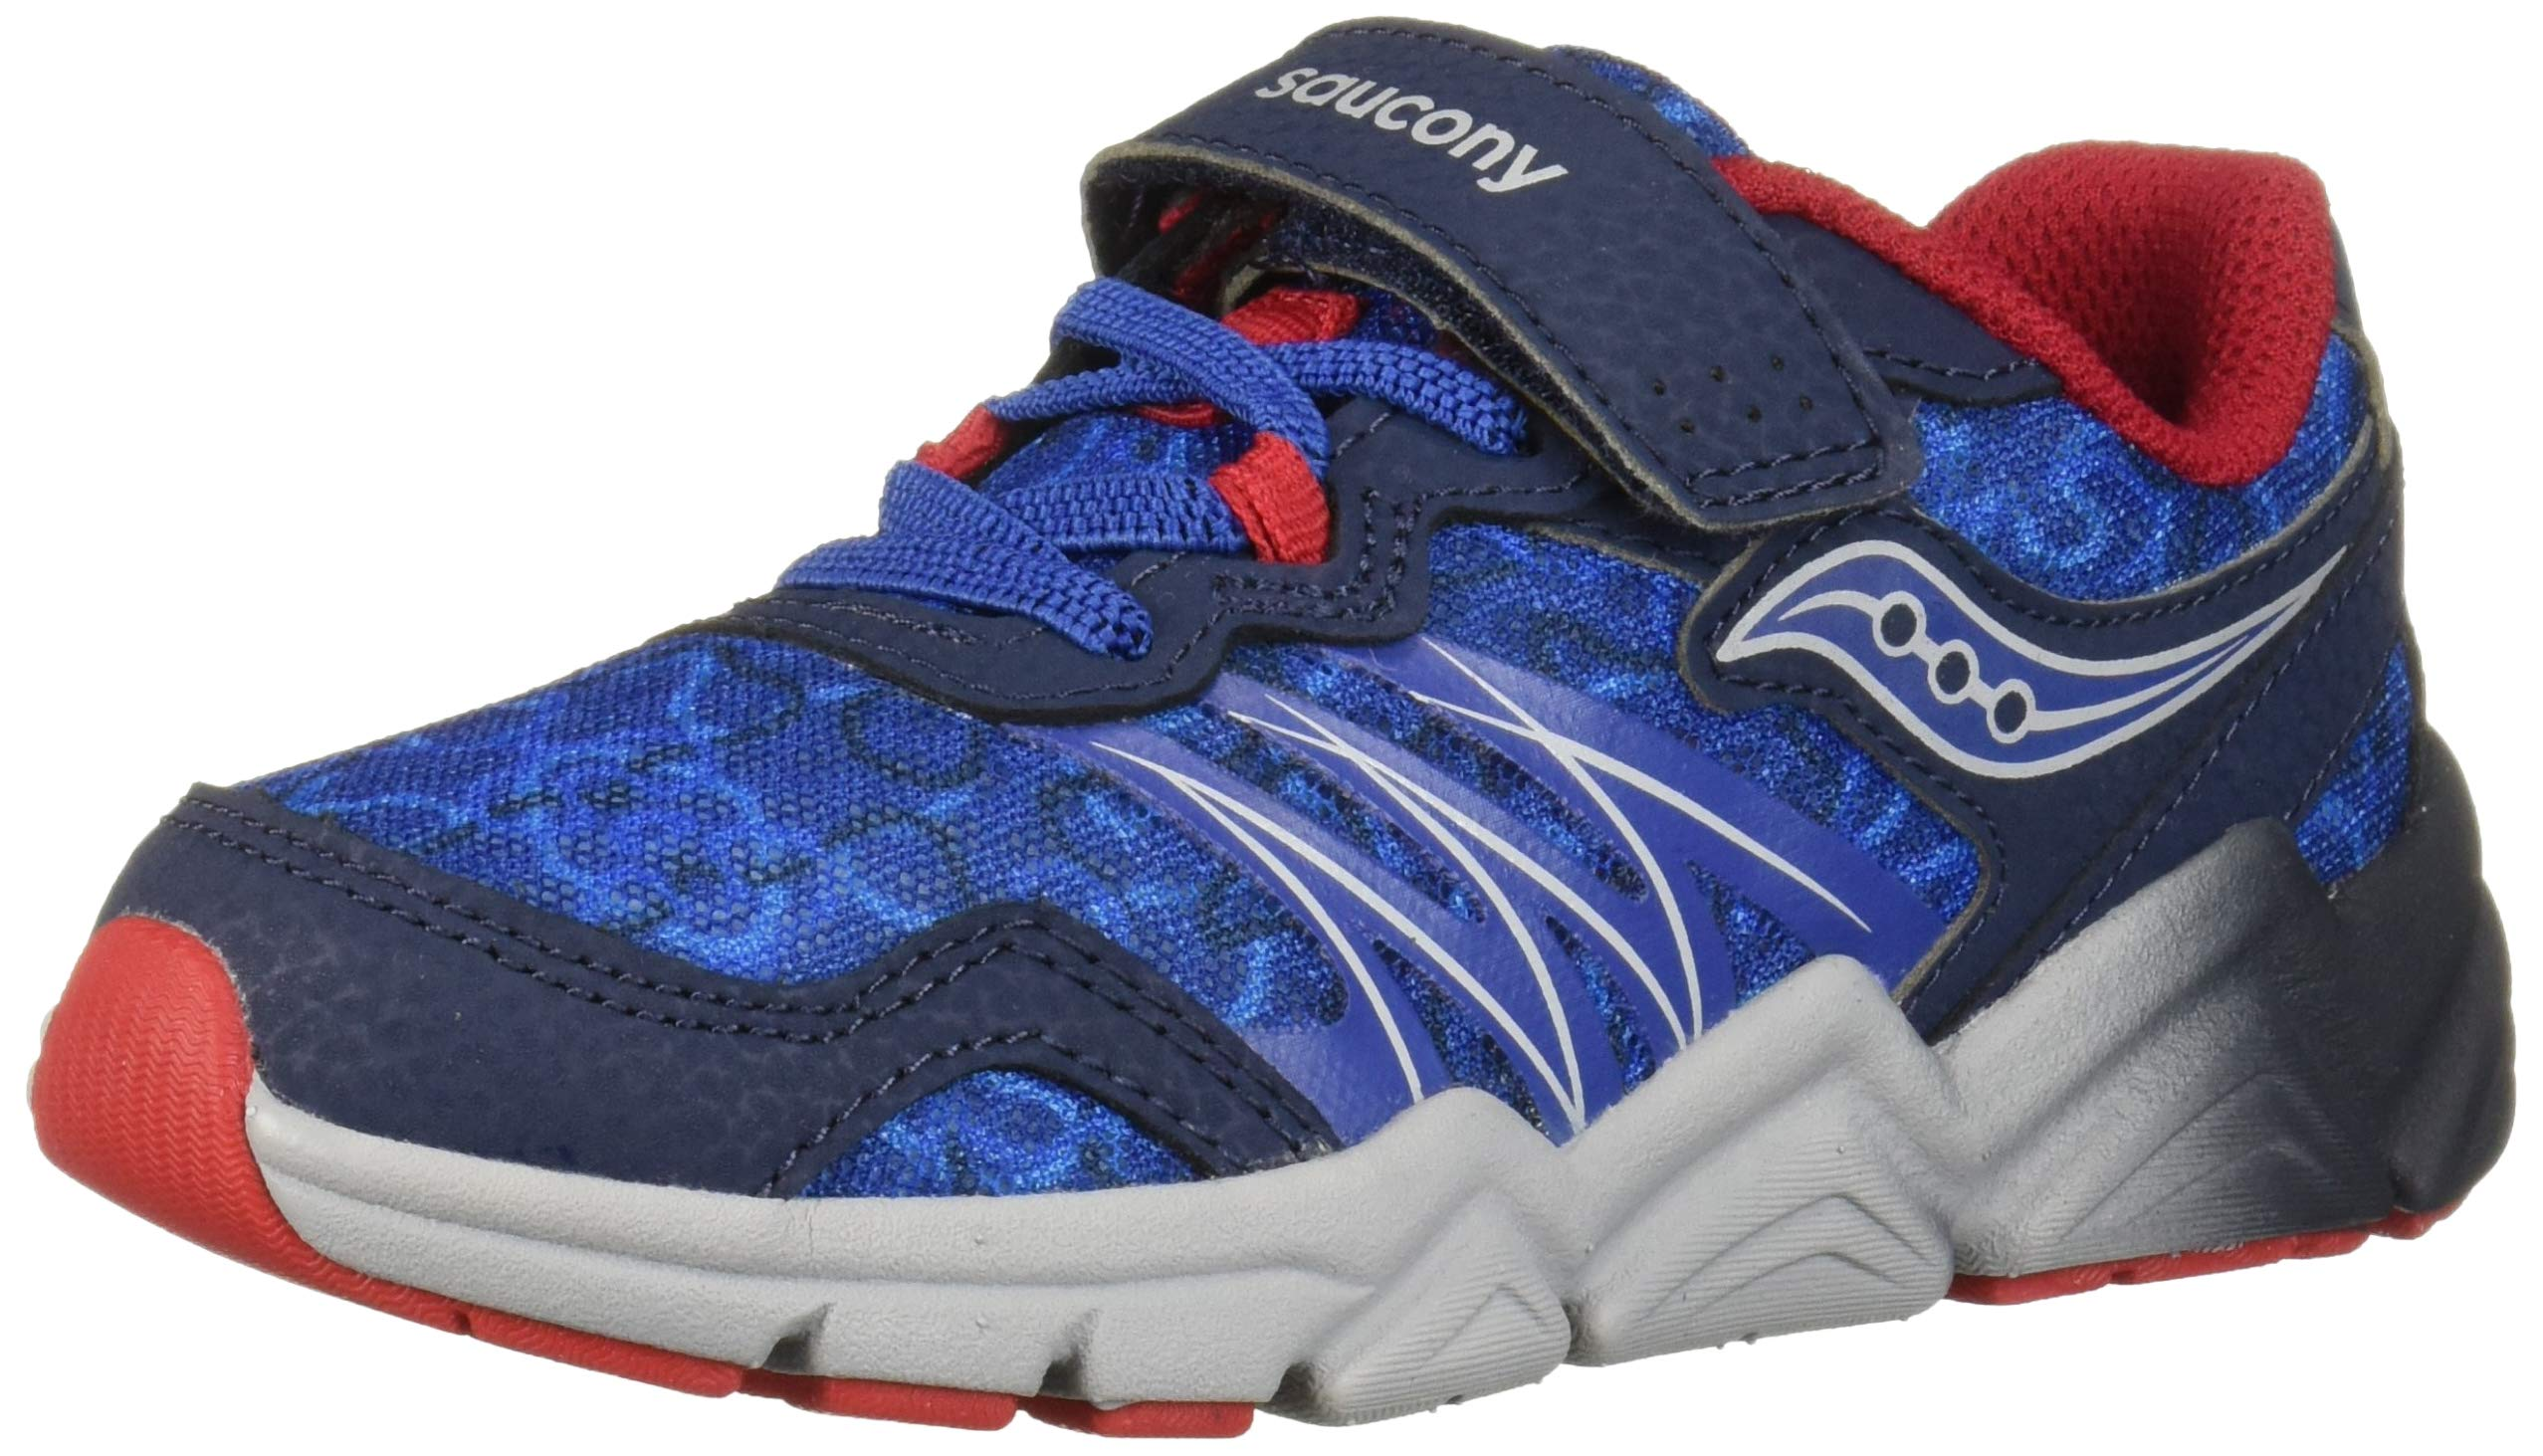 Saucony Boys' Flash A/C Sneaker, Navy/Red, 2 W US Little Kid